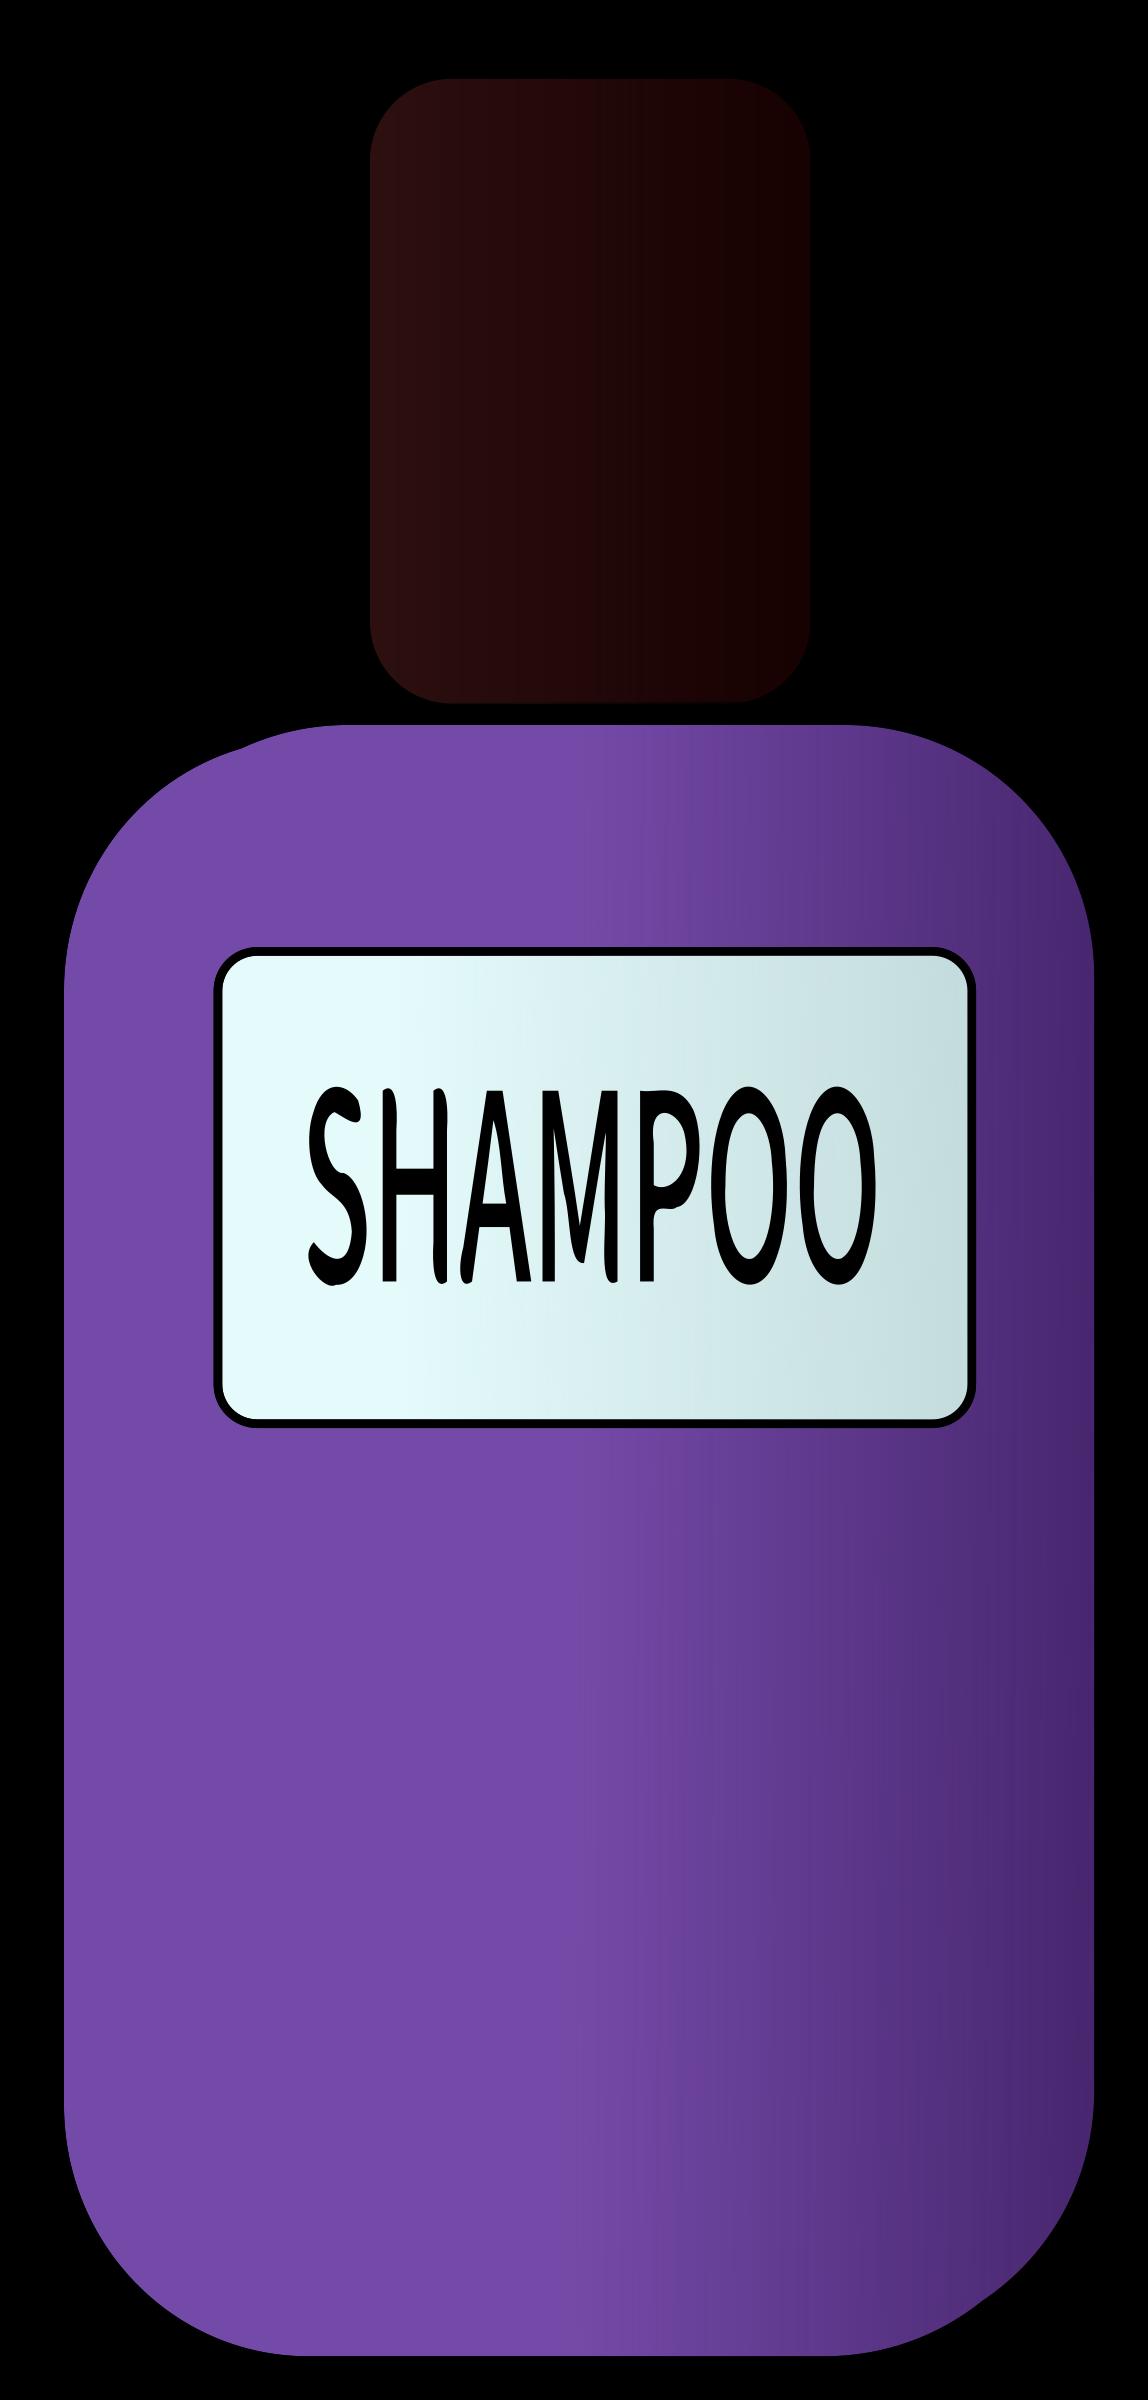 Shampoo clipart liquid thing.  huge freebie download